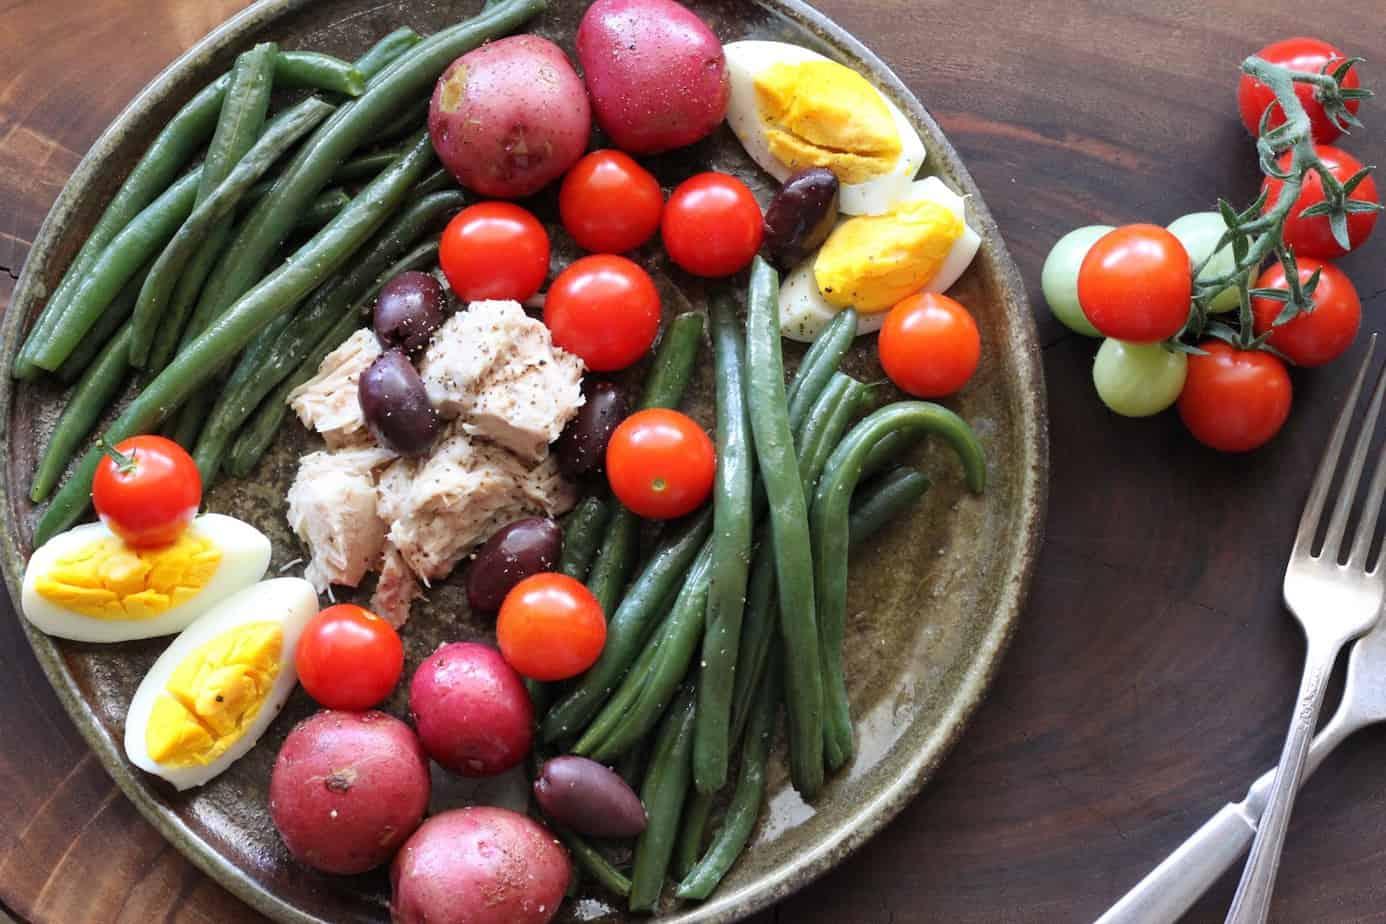 plate of tuna, green beans, potatoes